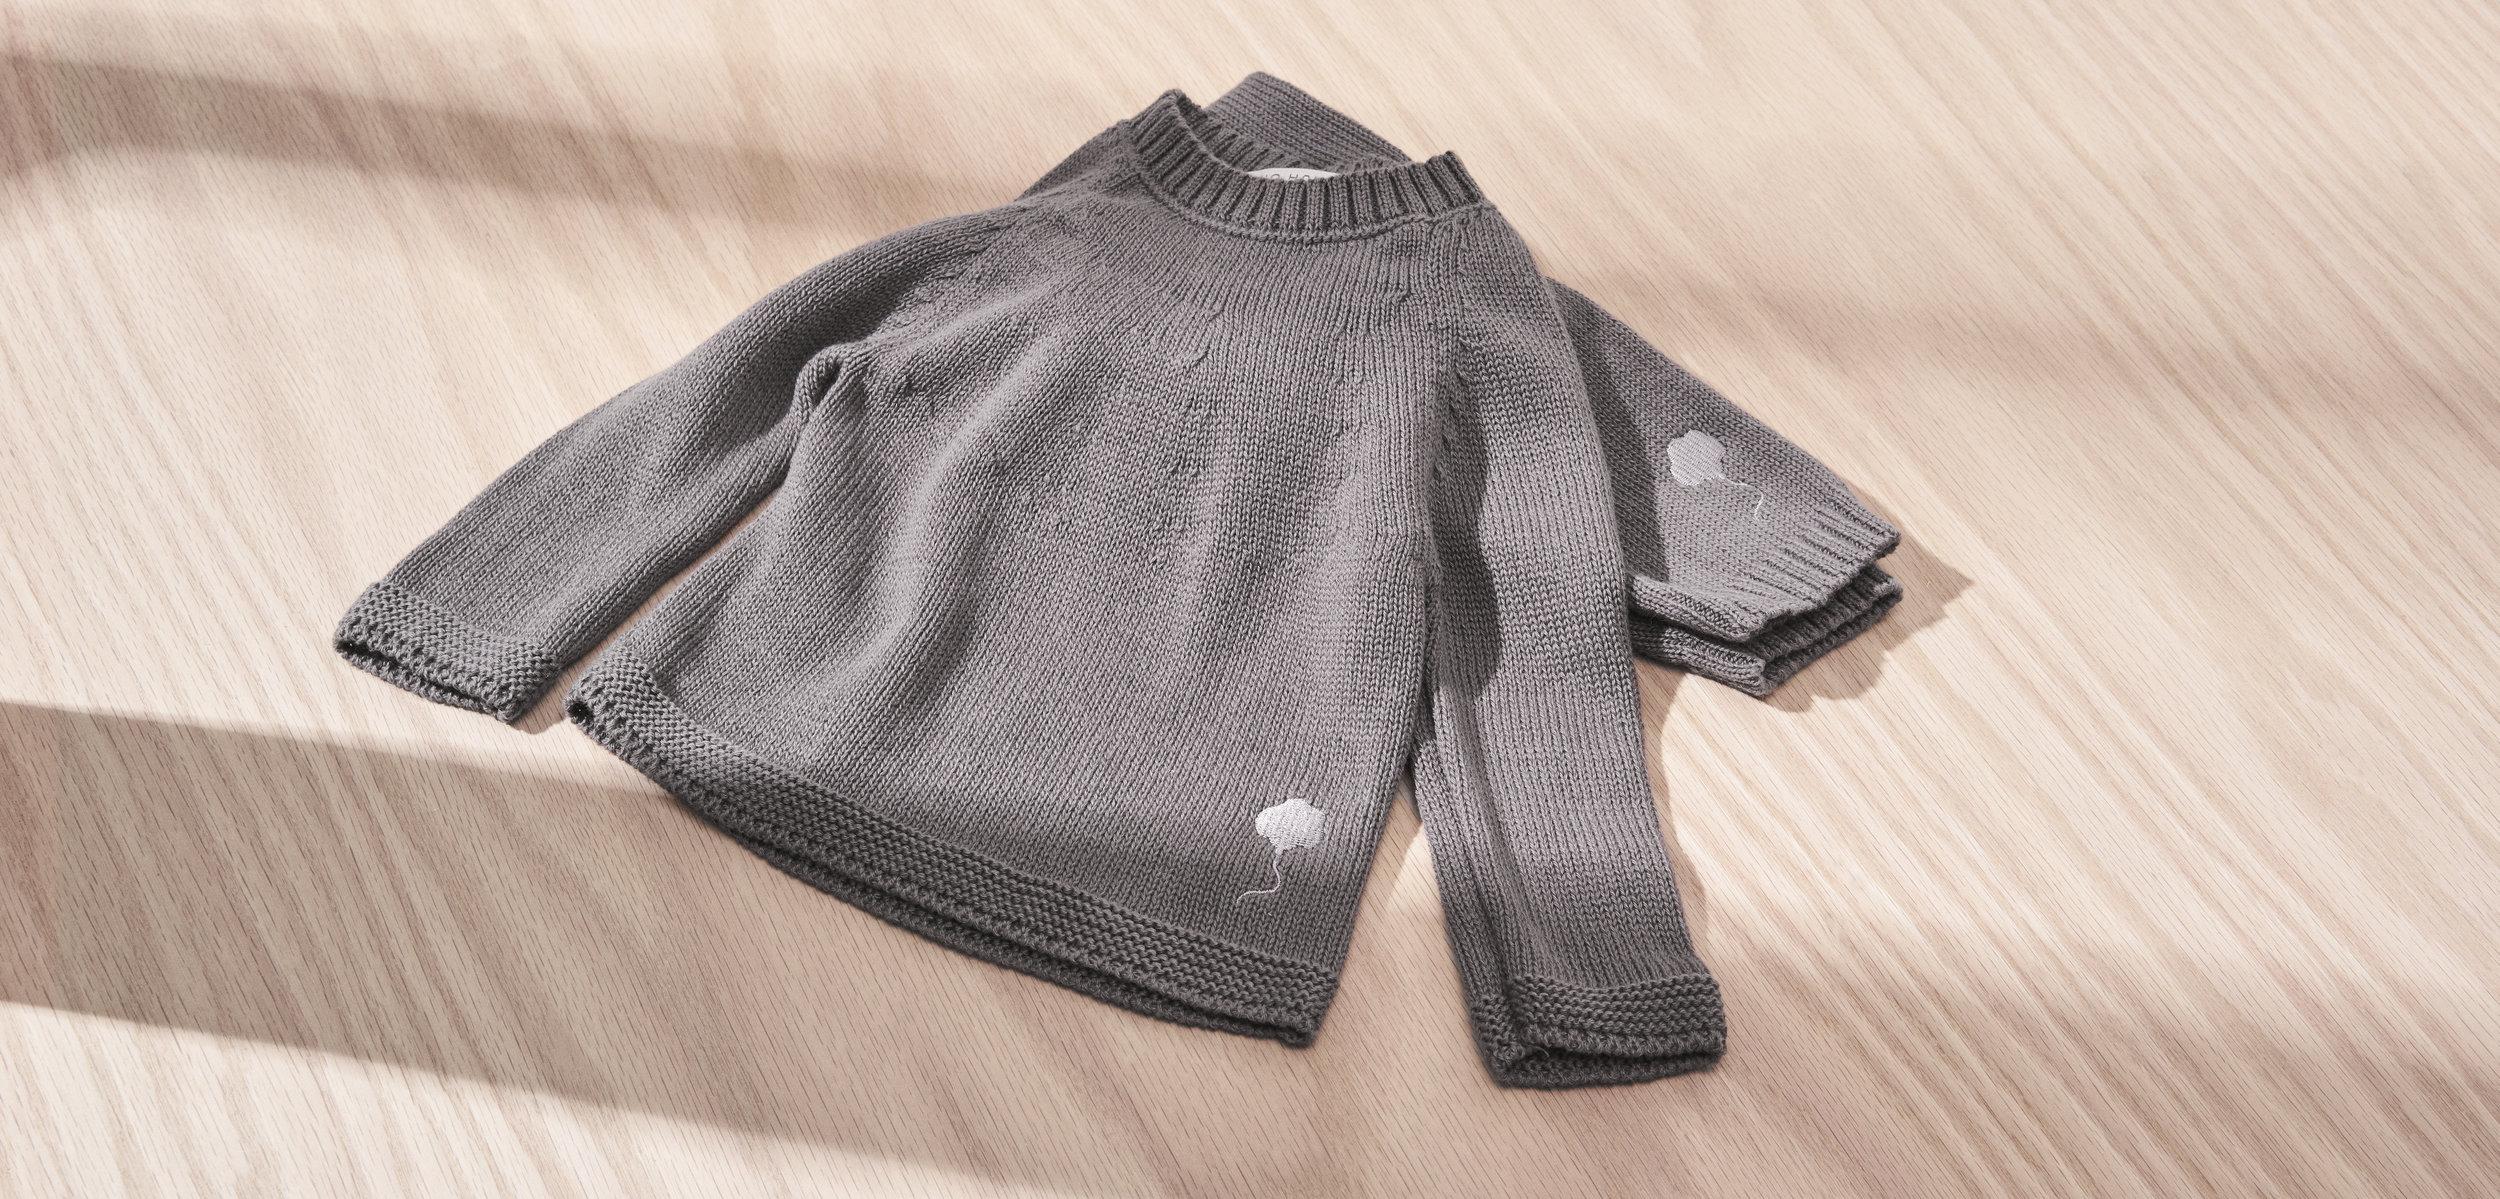 Neel Travel Suit in Cumulus Grey Cotton HP .jpg